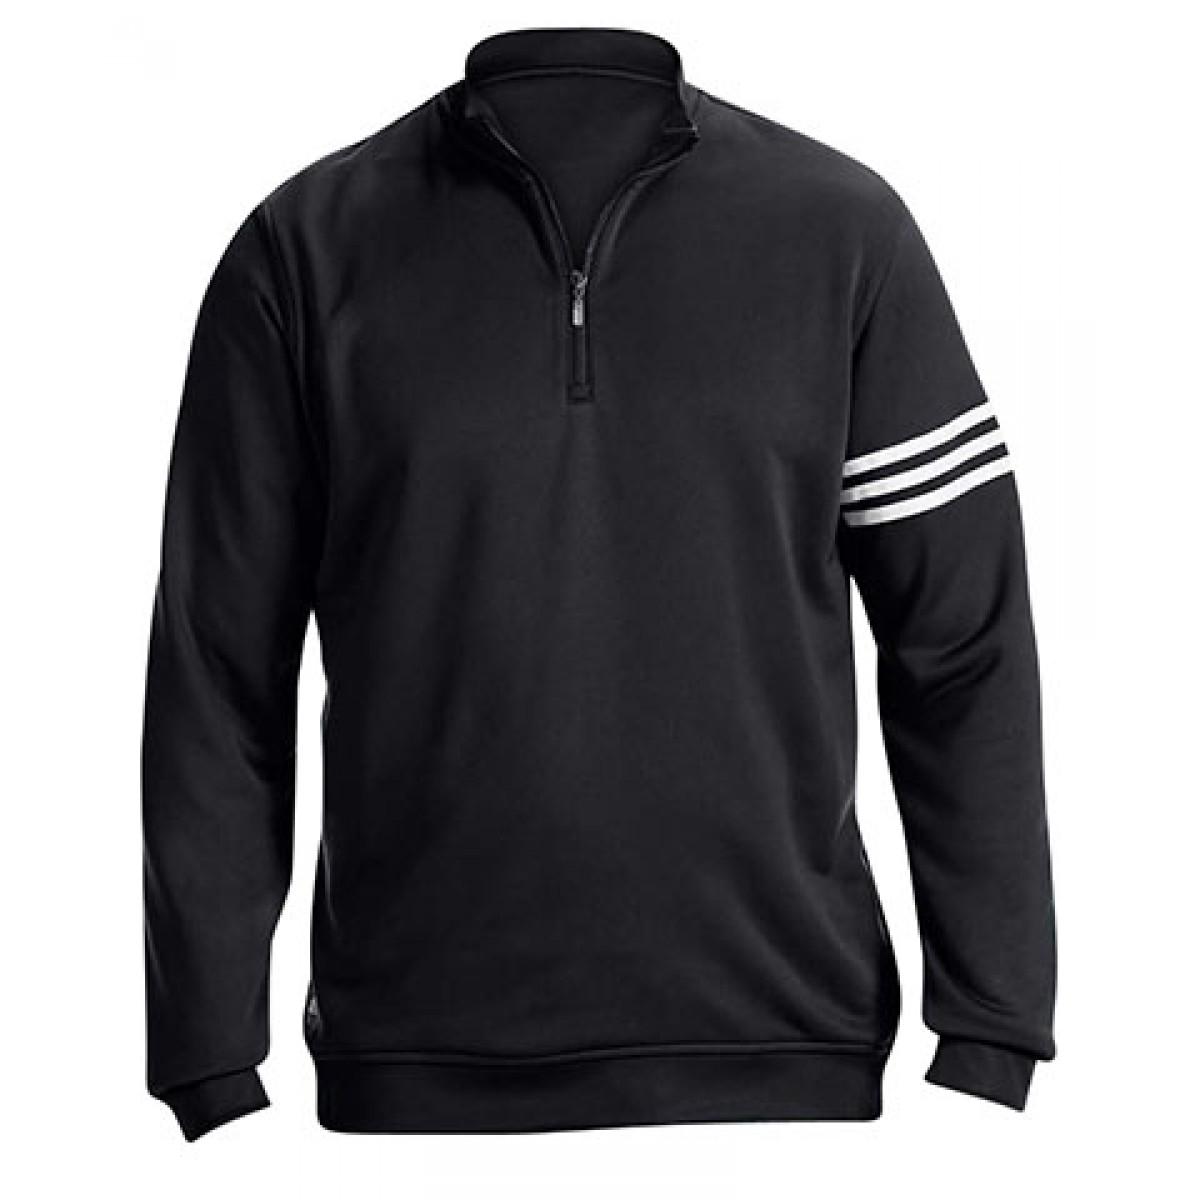 Adidas Golf Men's ClimaLite® 3-Stripes Pullover-Black-3XL